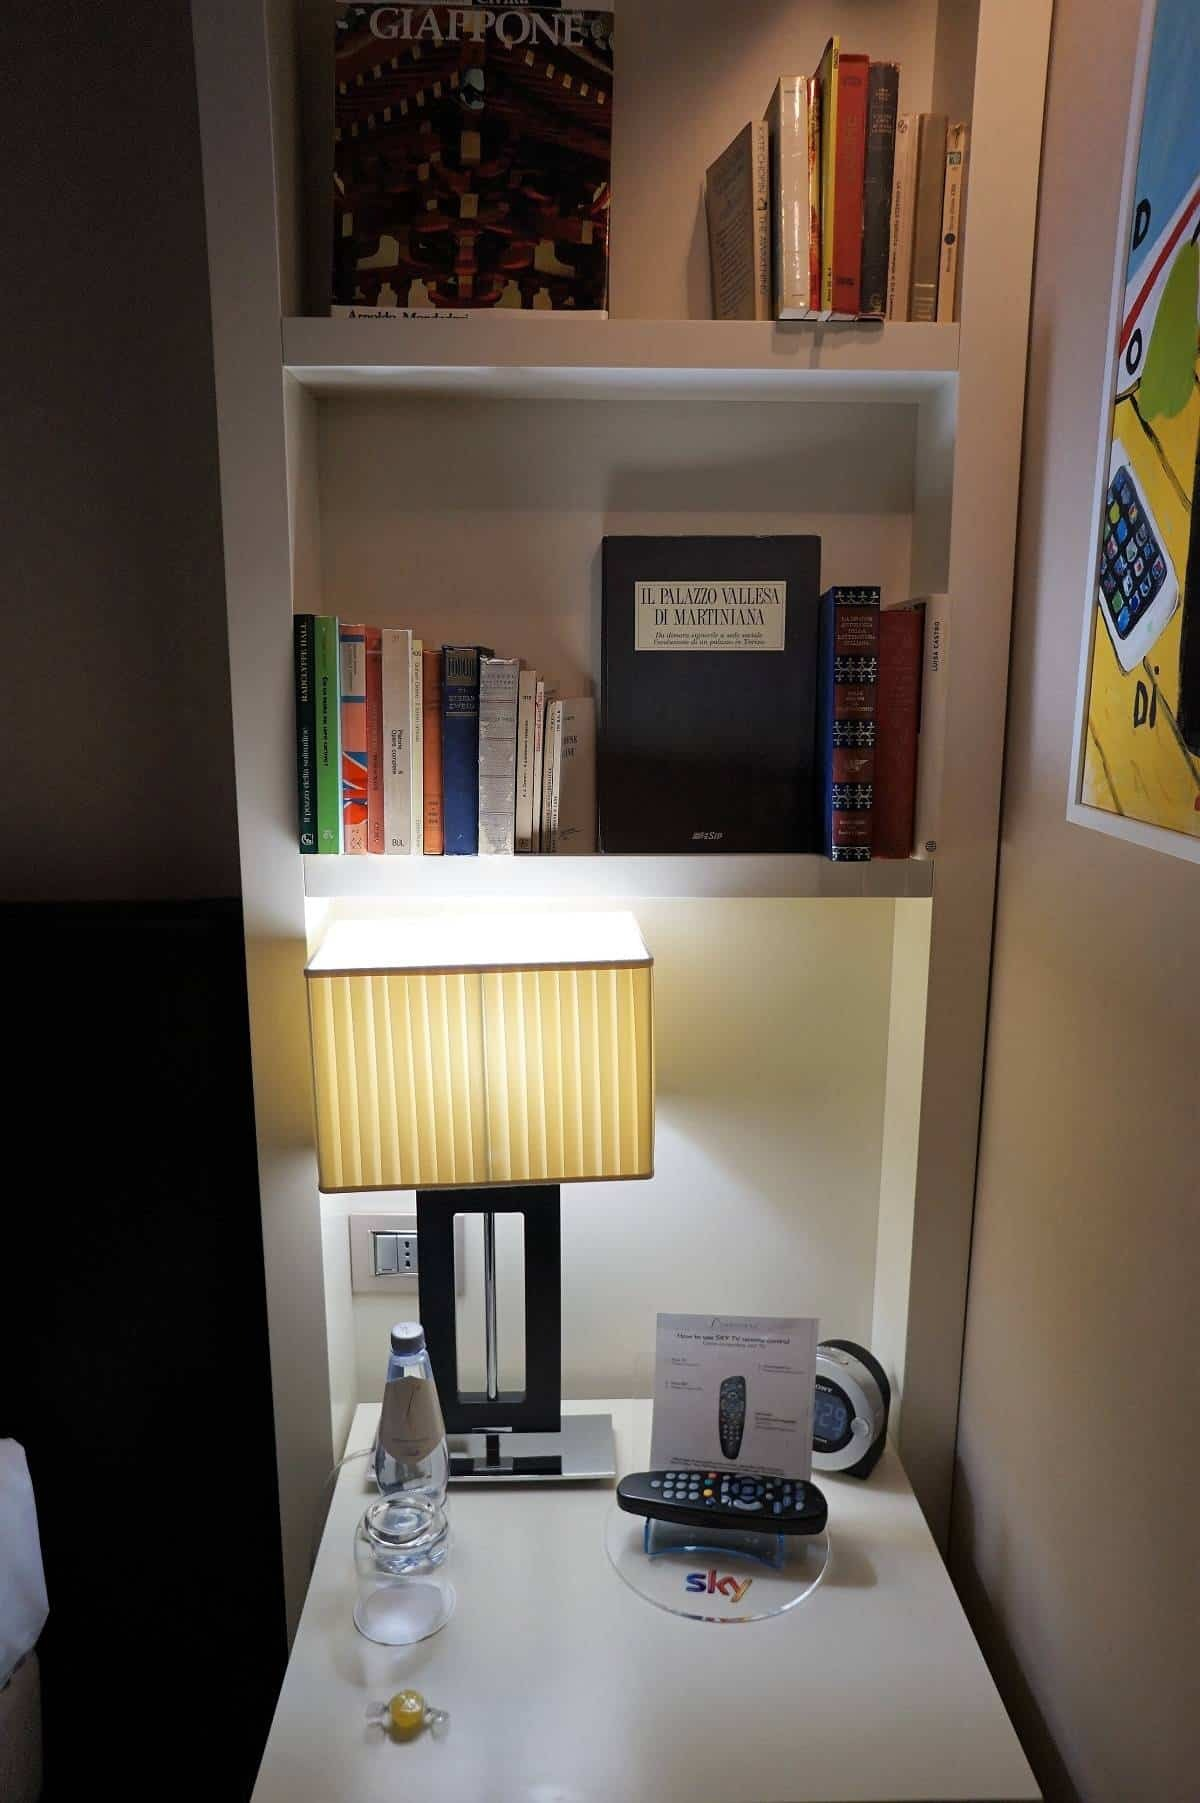 Bookshelf decor at The First Roma